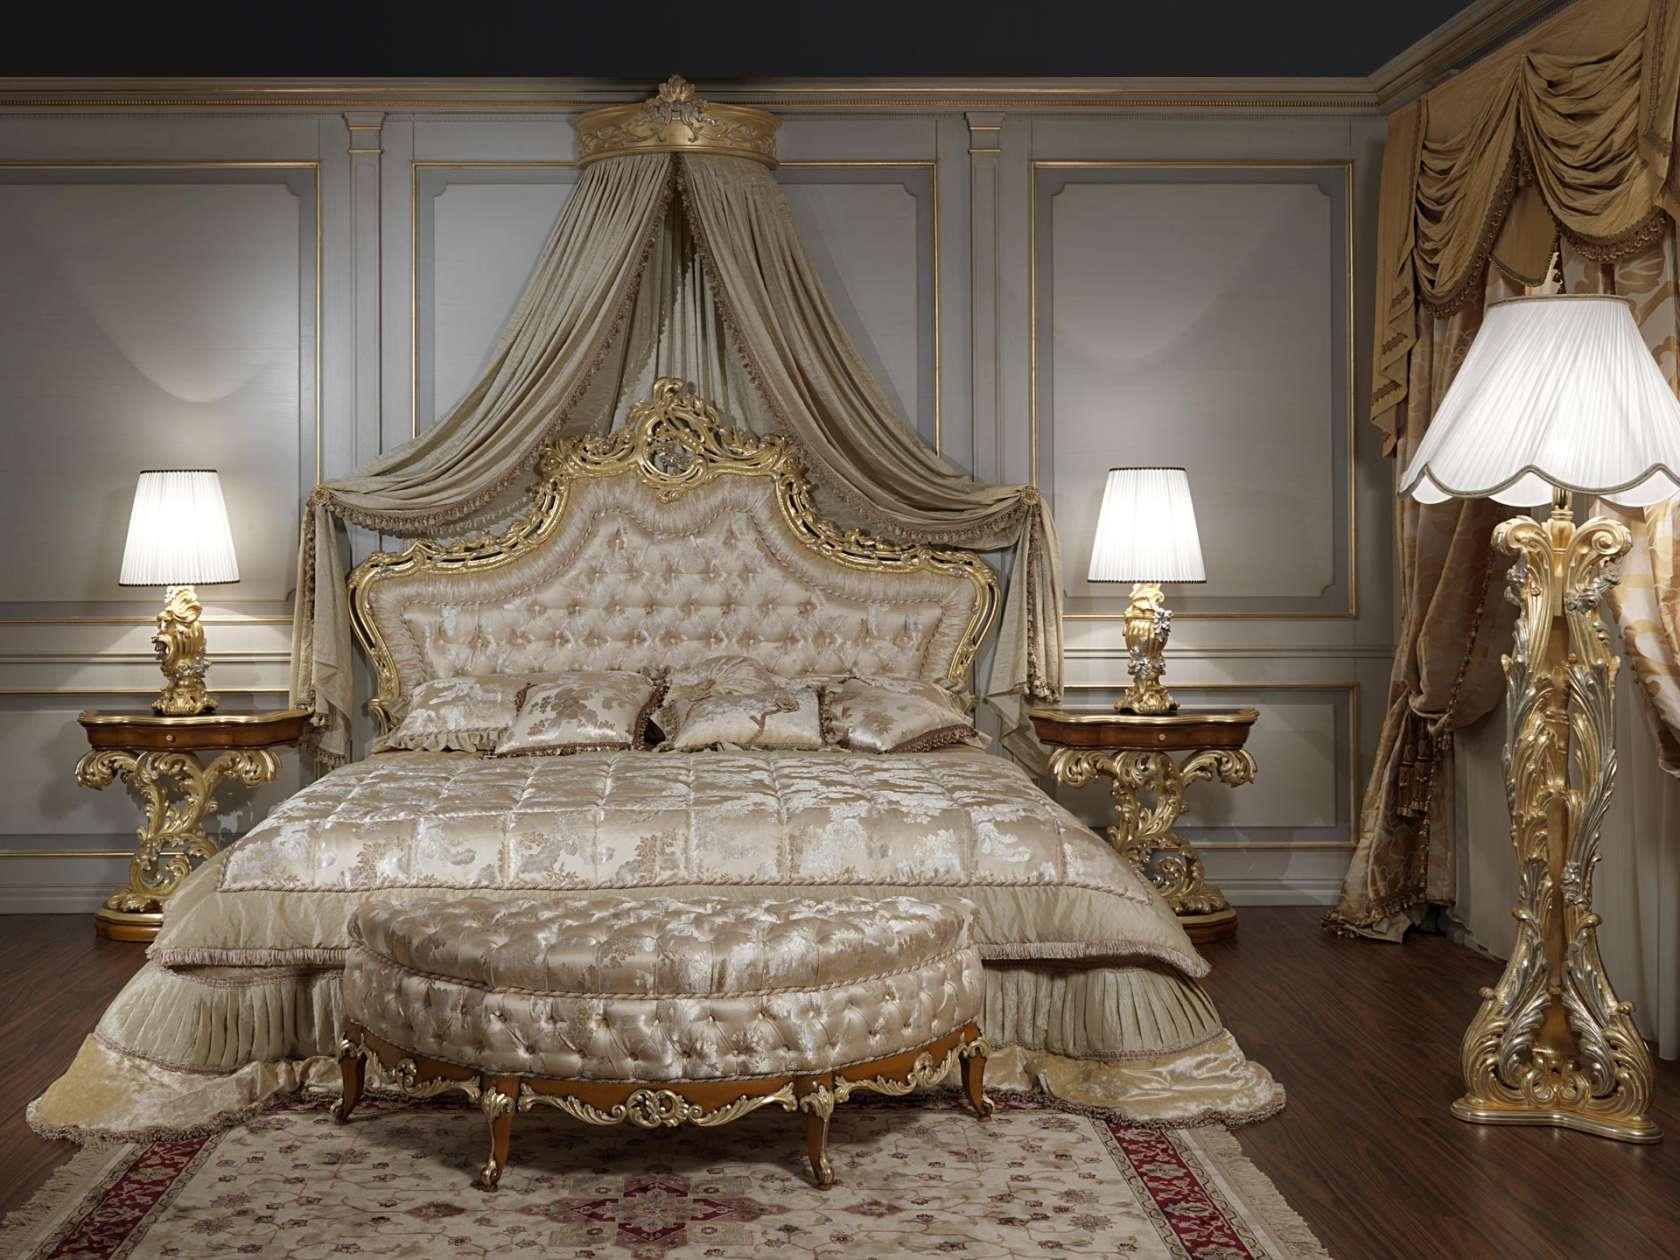 Roman Baroque Bed Art 2017